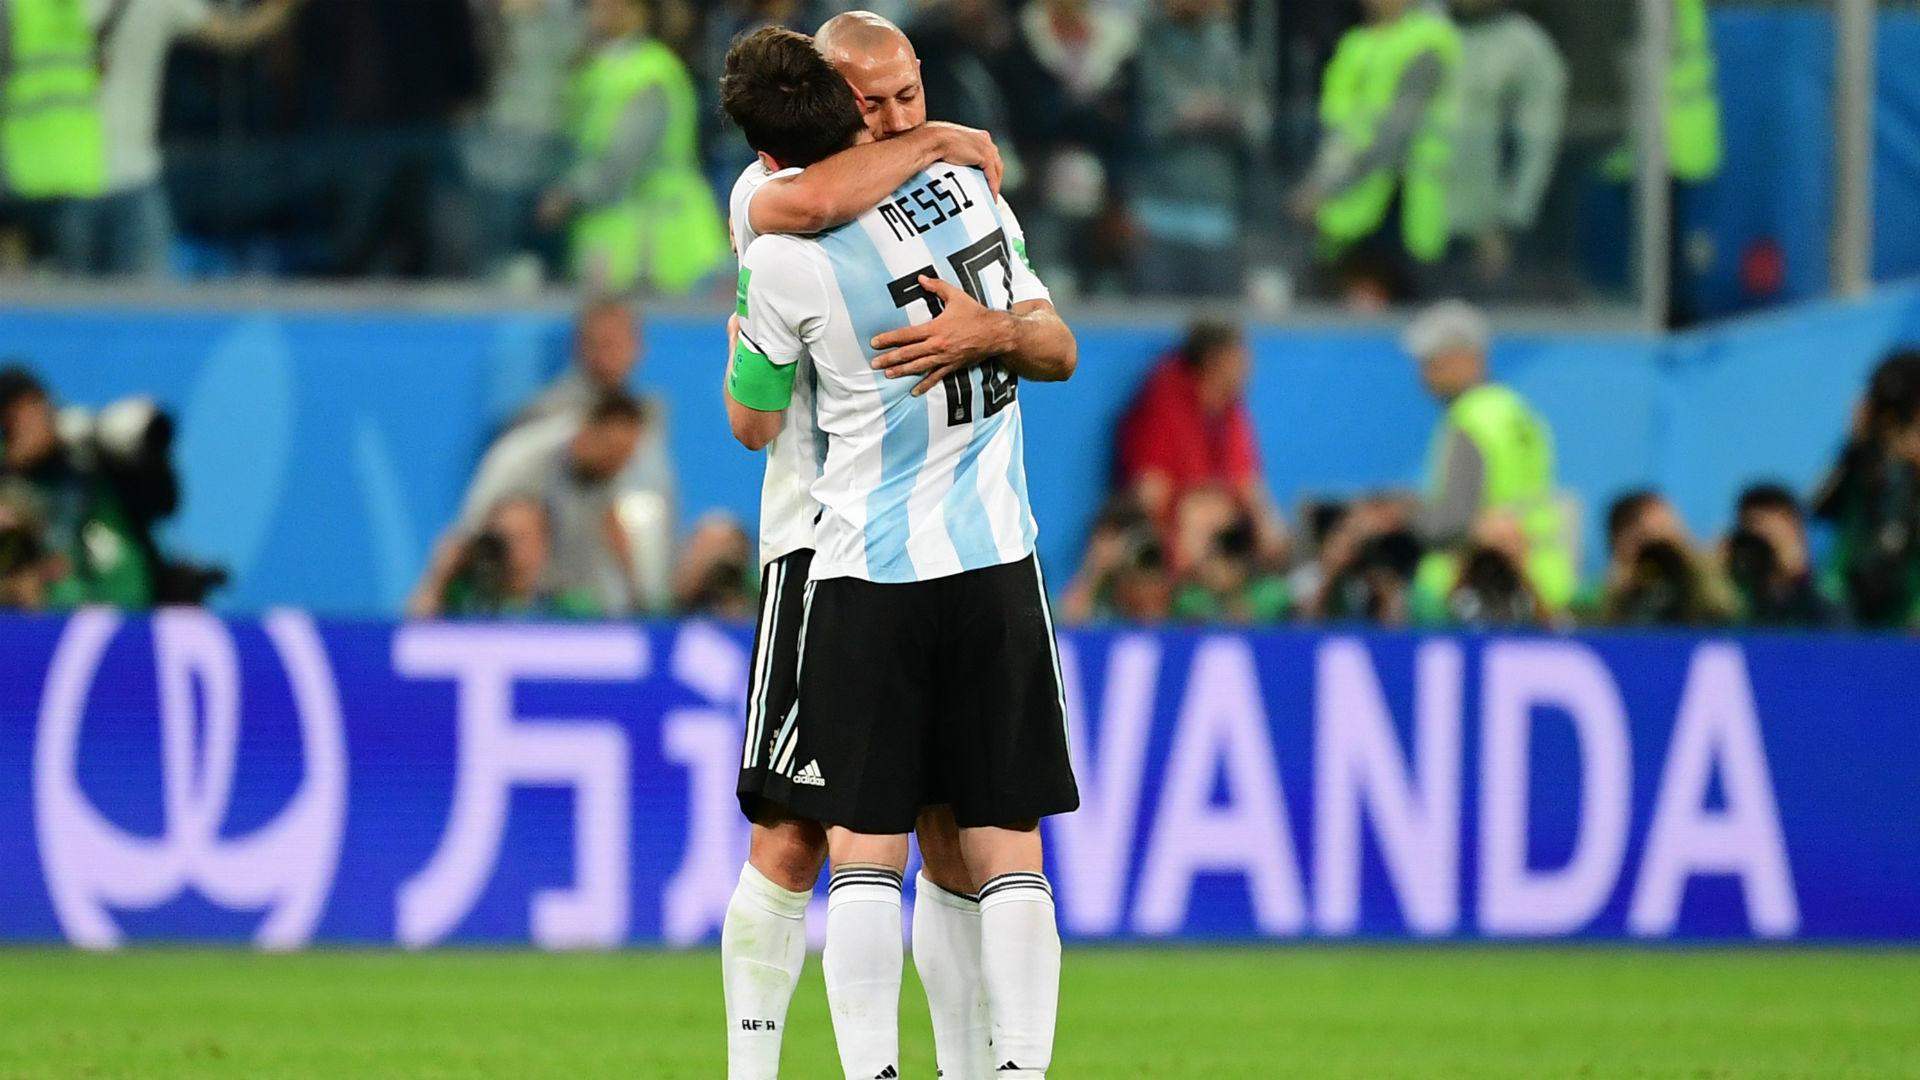 Messi Mascherano Argentina Nigeria World Cup Russi 2018 26062018